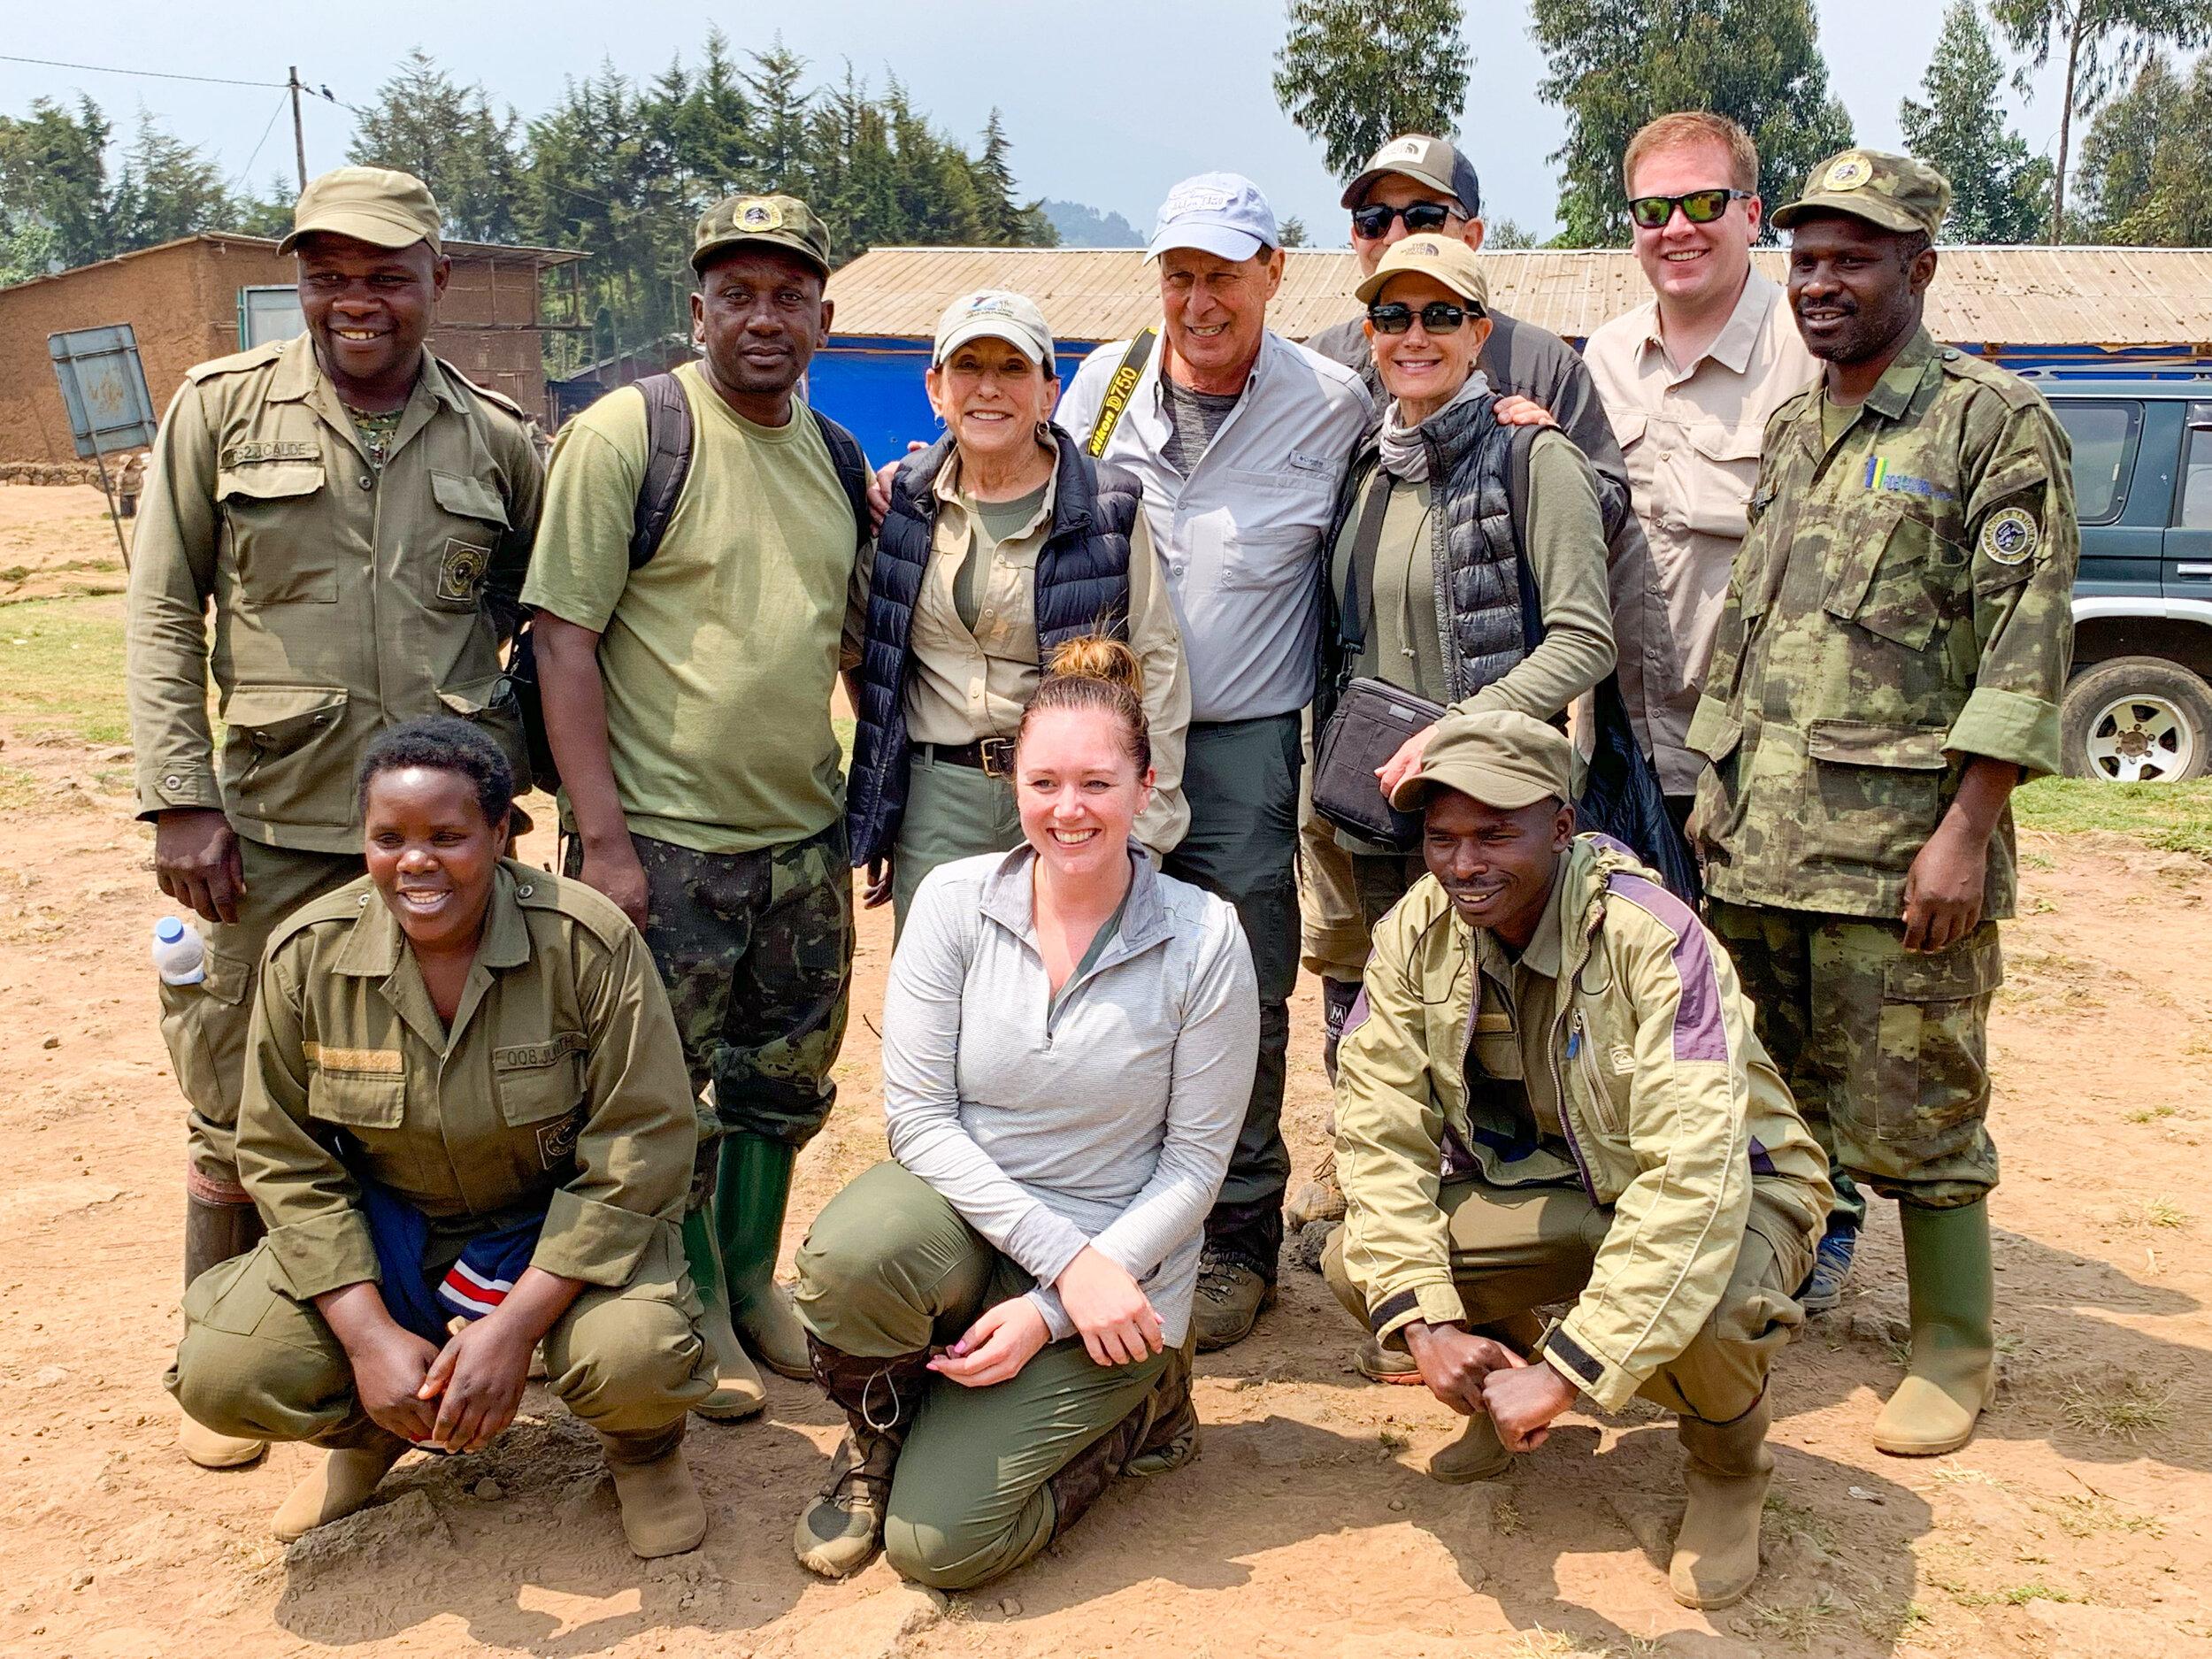 Africa_Rwanda_Gorilla_trek-39.jpg